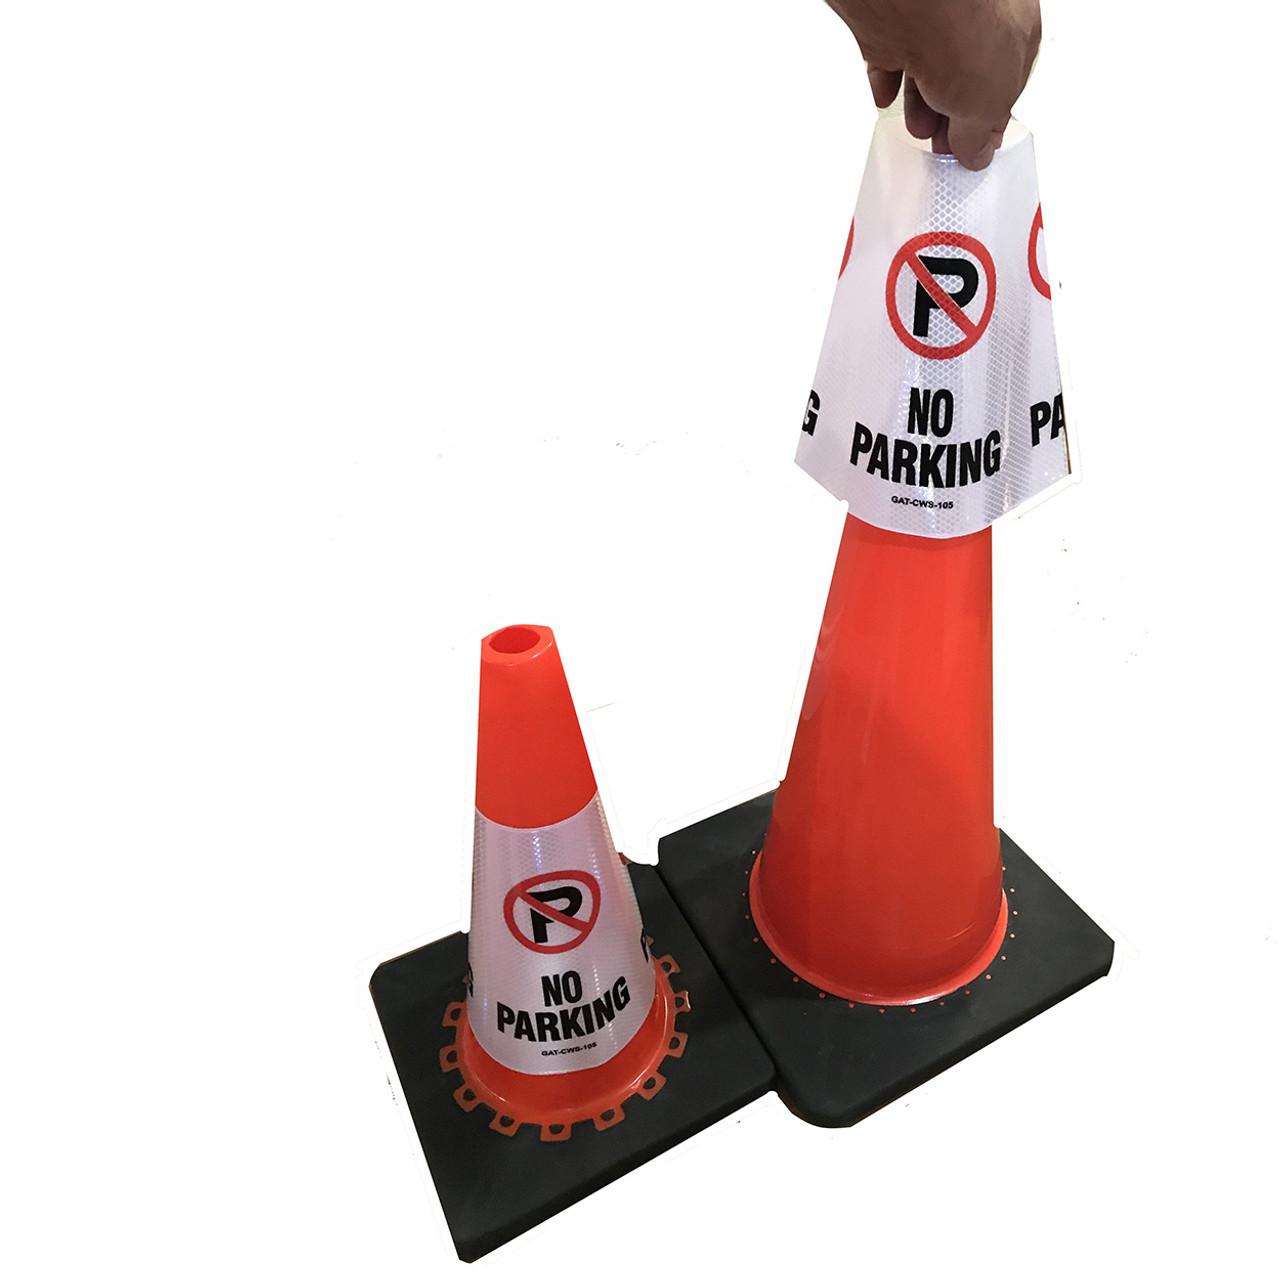 No parking Safety Cone Collar - Reflective